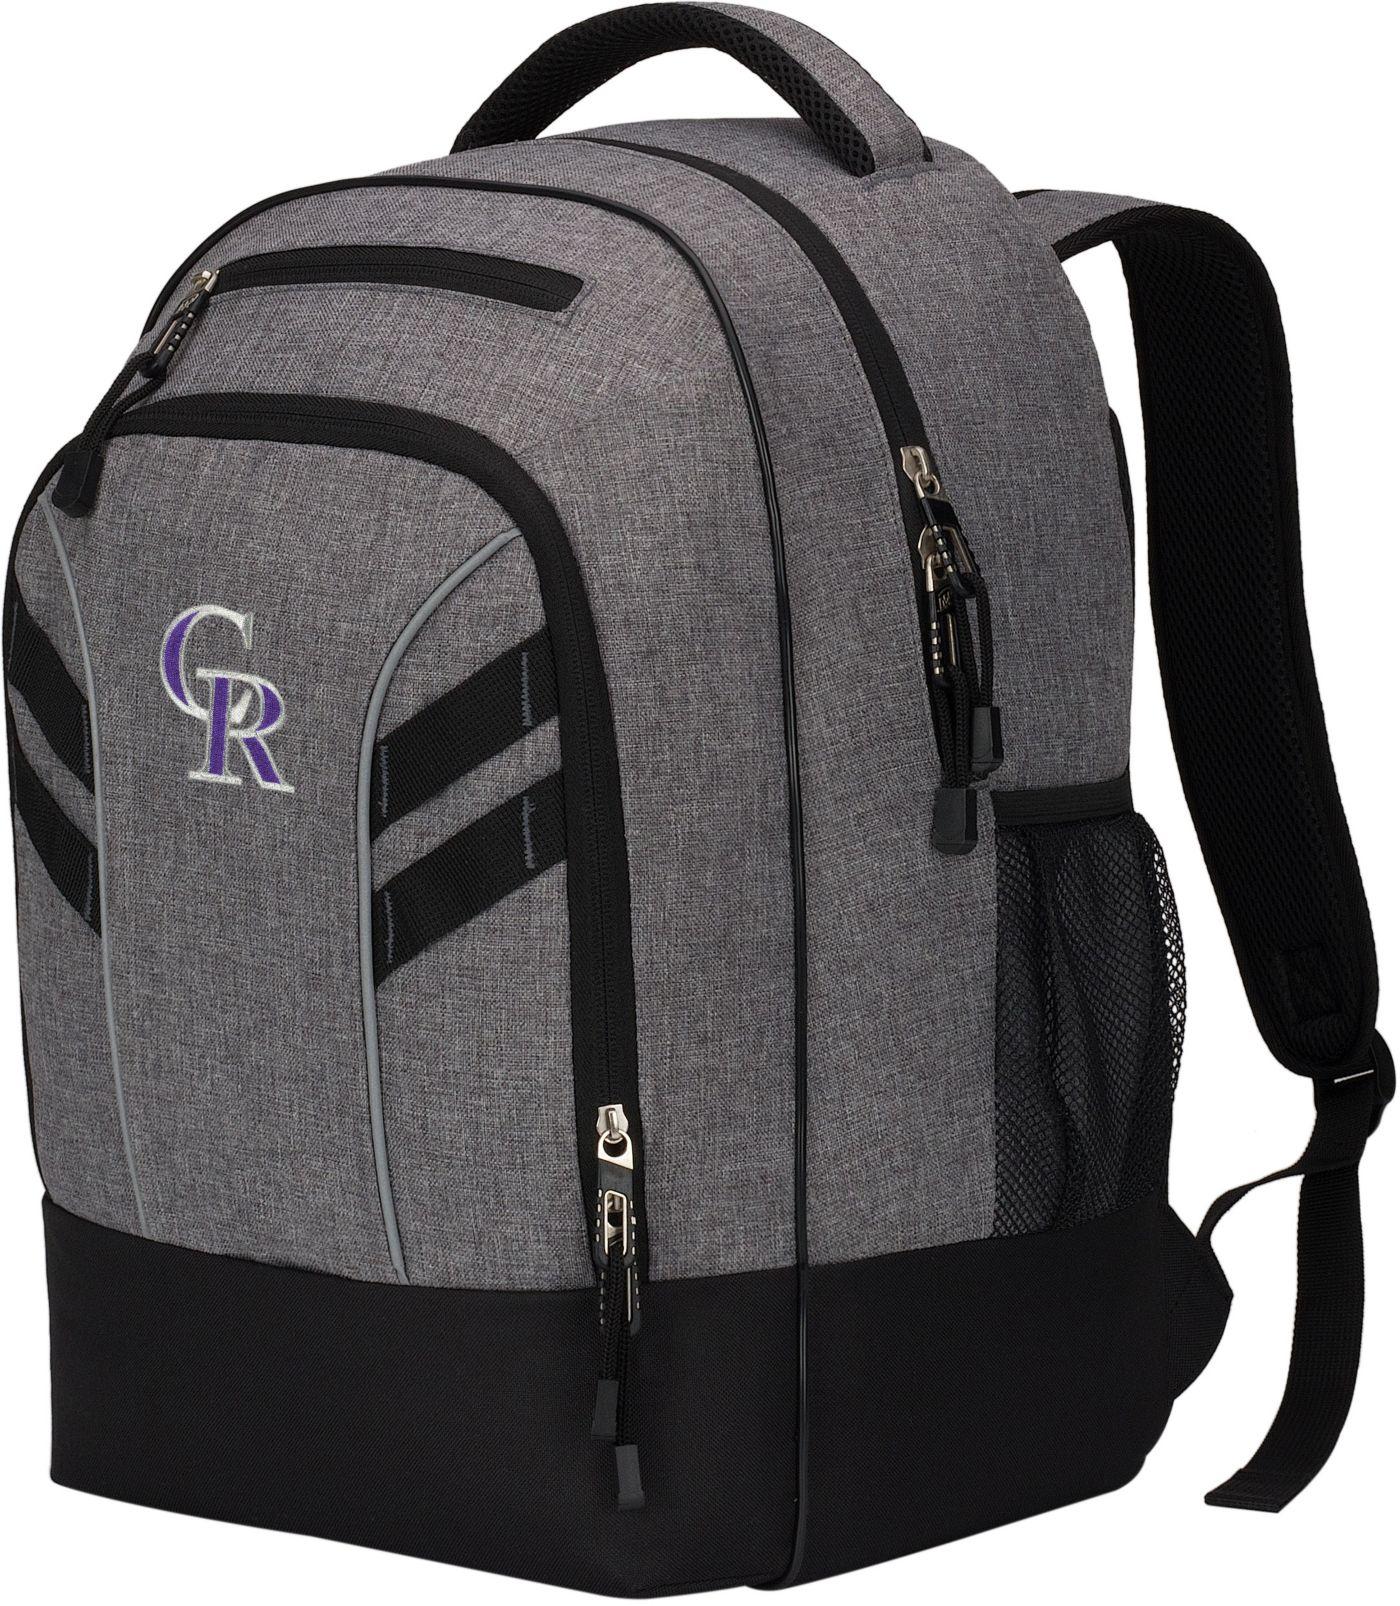 Northwest Colorado Rockies Razor Backpack